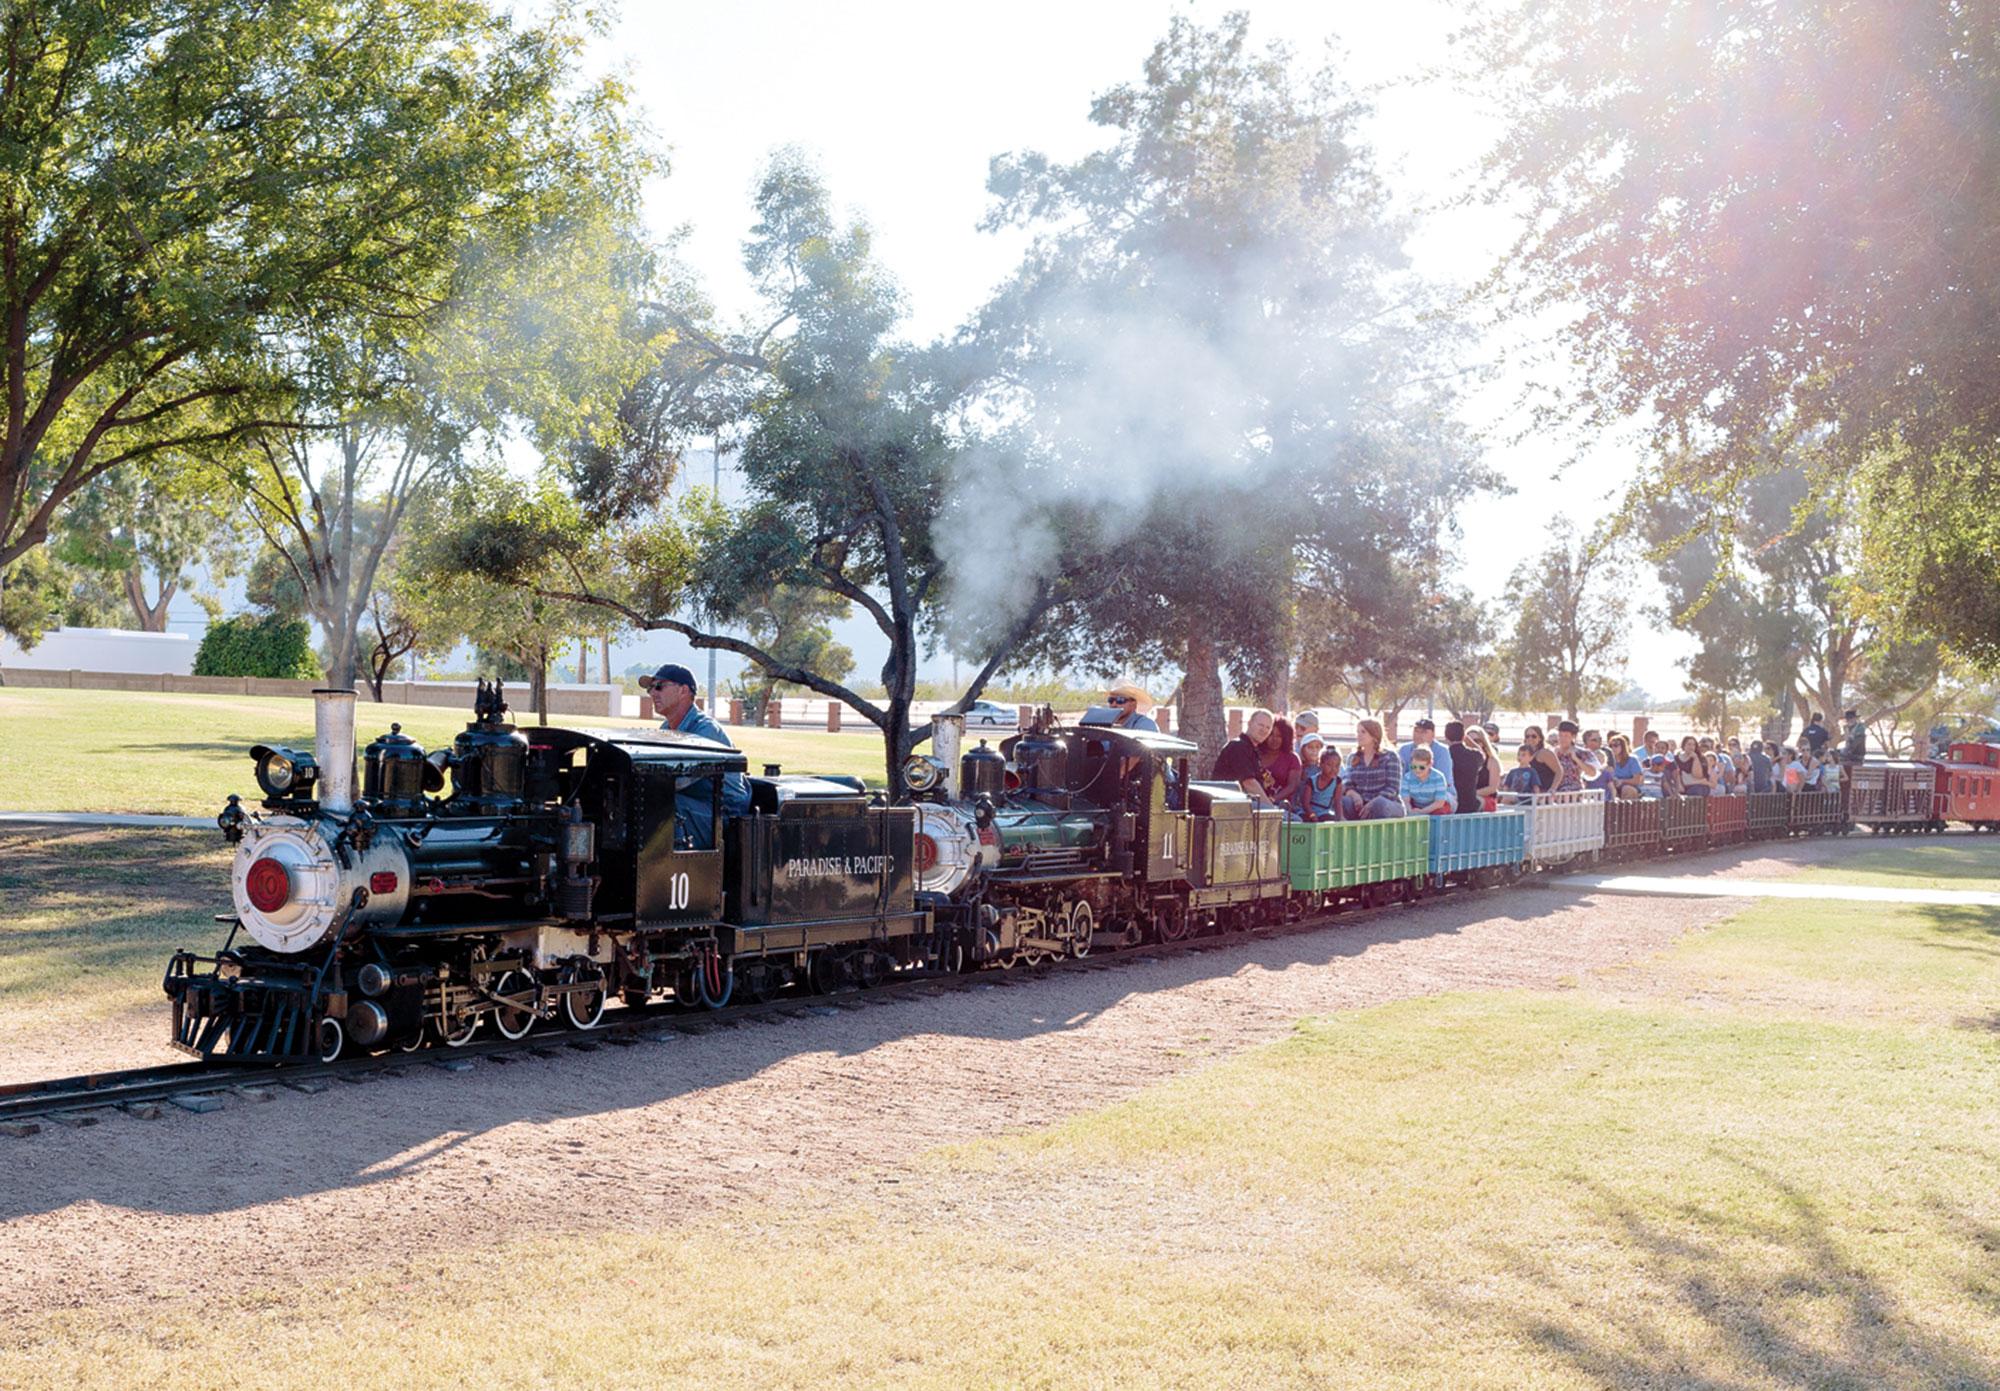 Photo courtesy Mccormick-Stillman Railroad Park